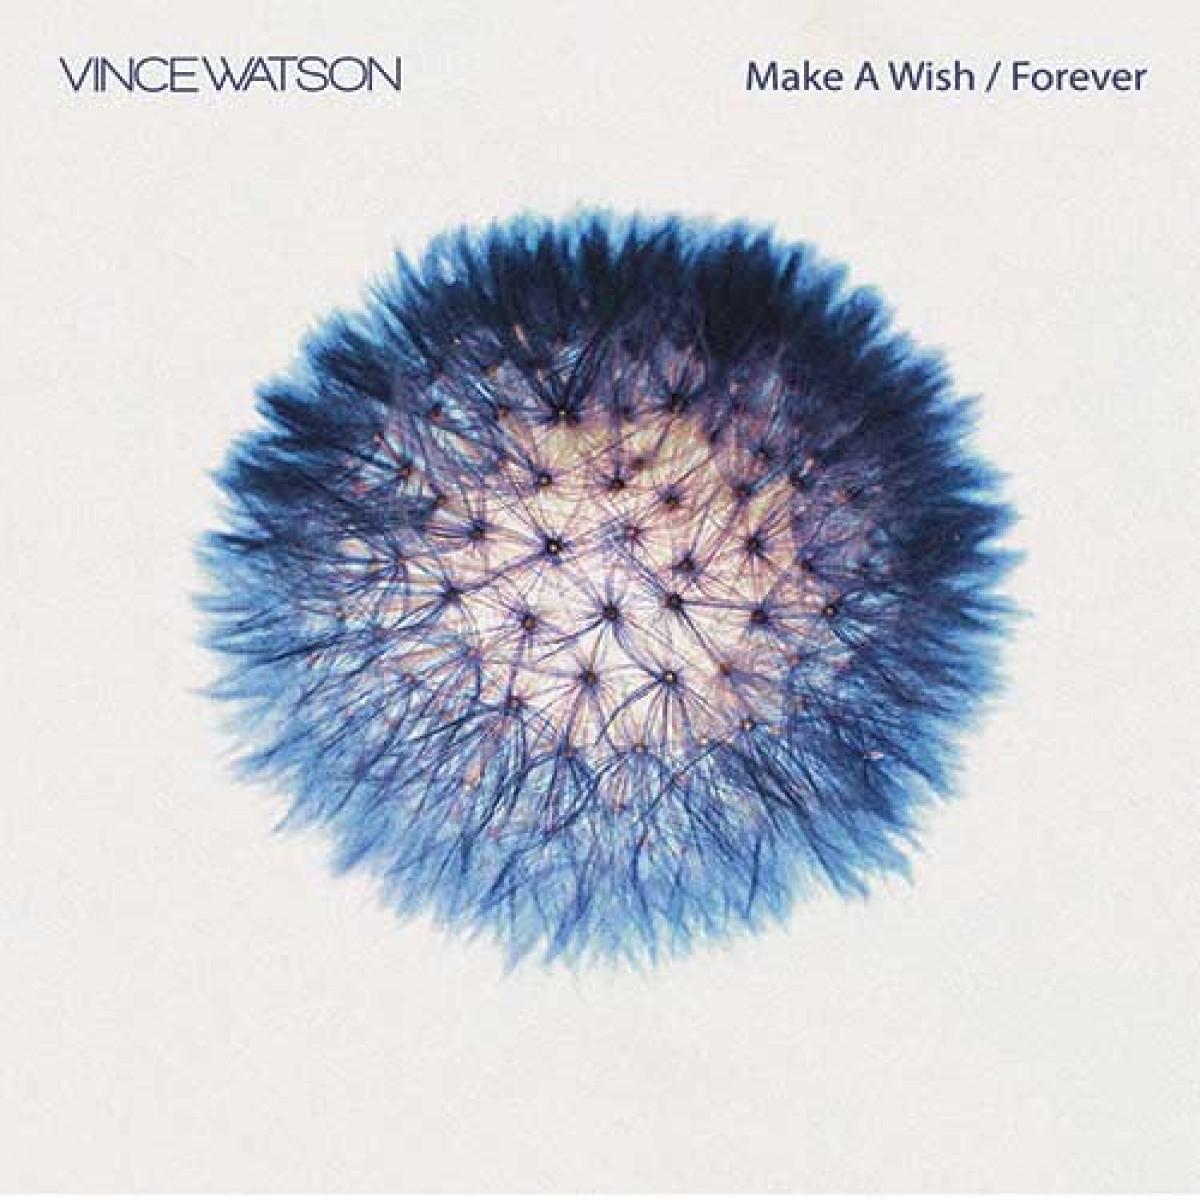 Vince Watson Make A Wish